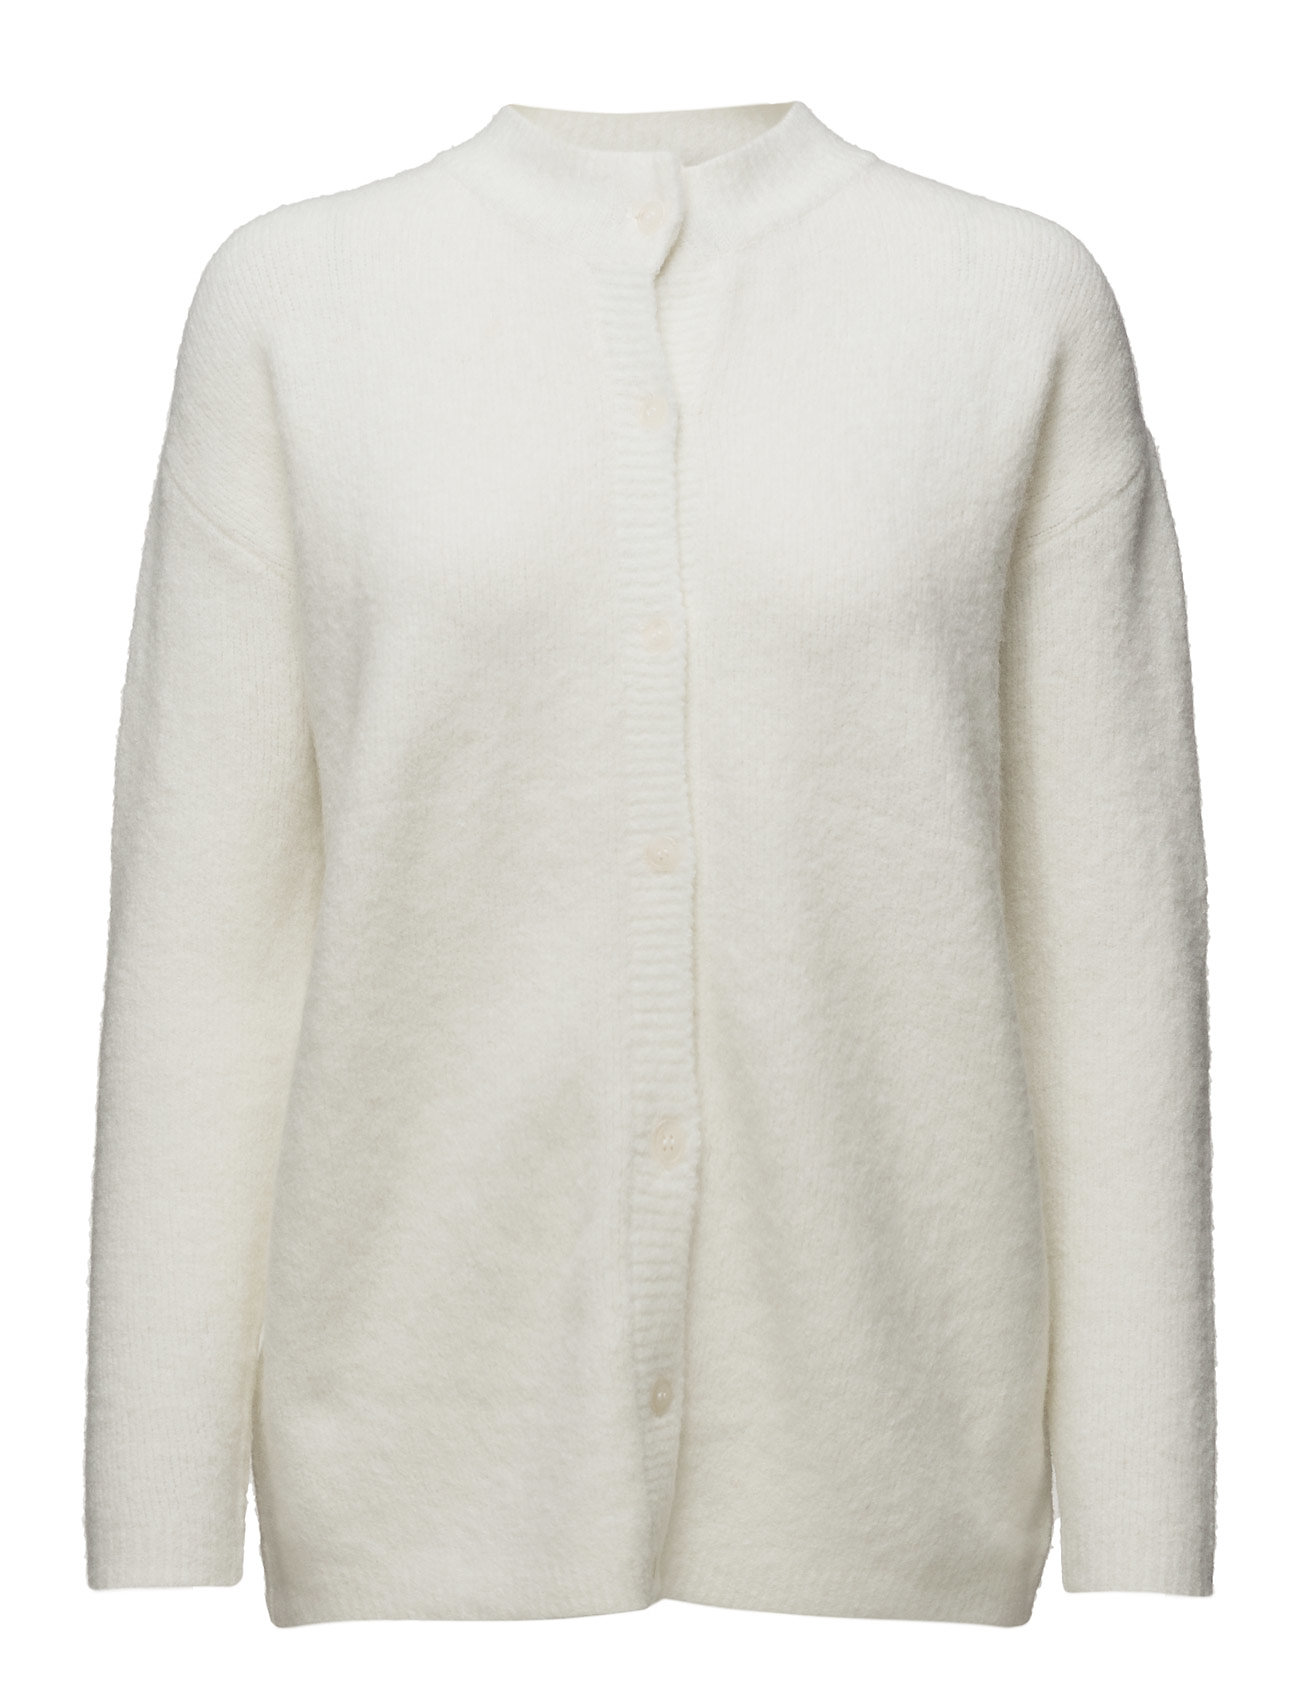 Oyoo Knit Cardigan (2/off White) (115.43 €) - Stig P   Boozt.com